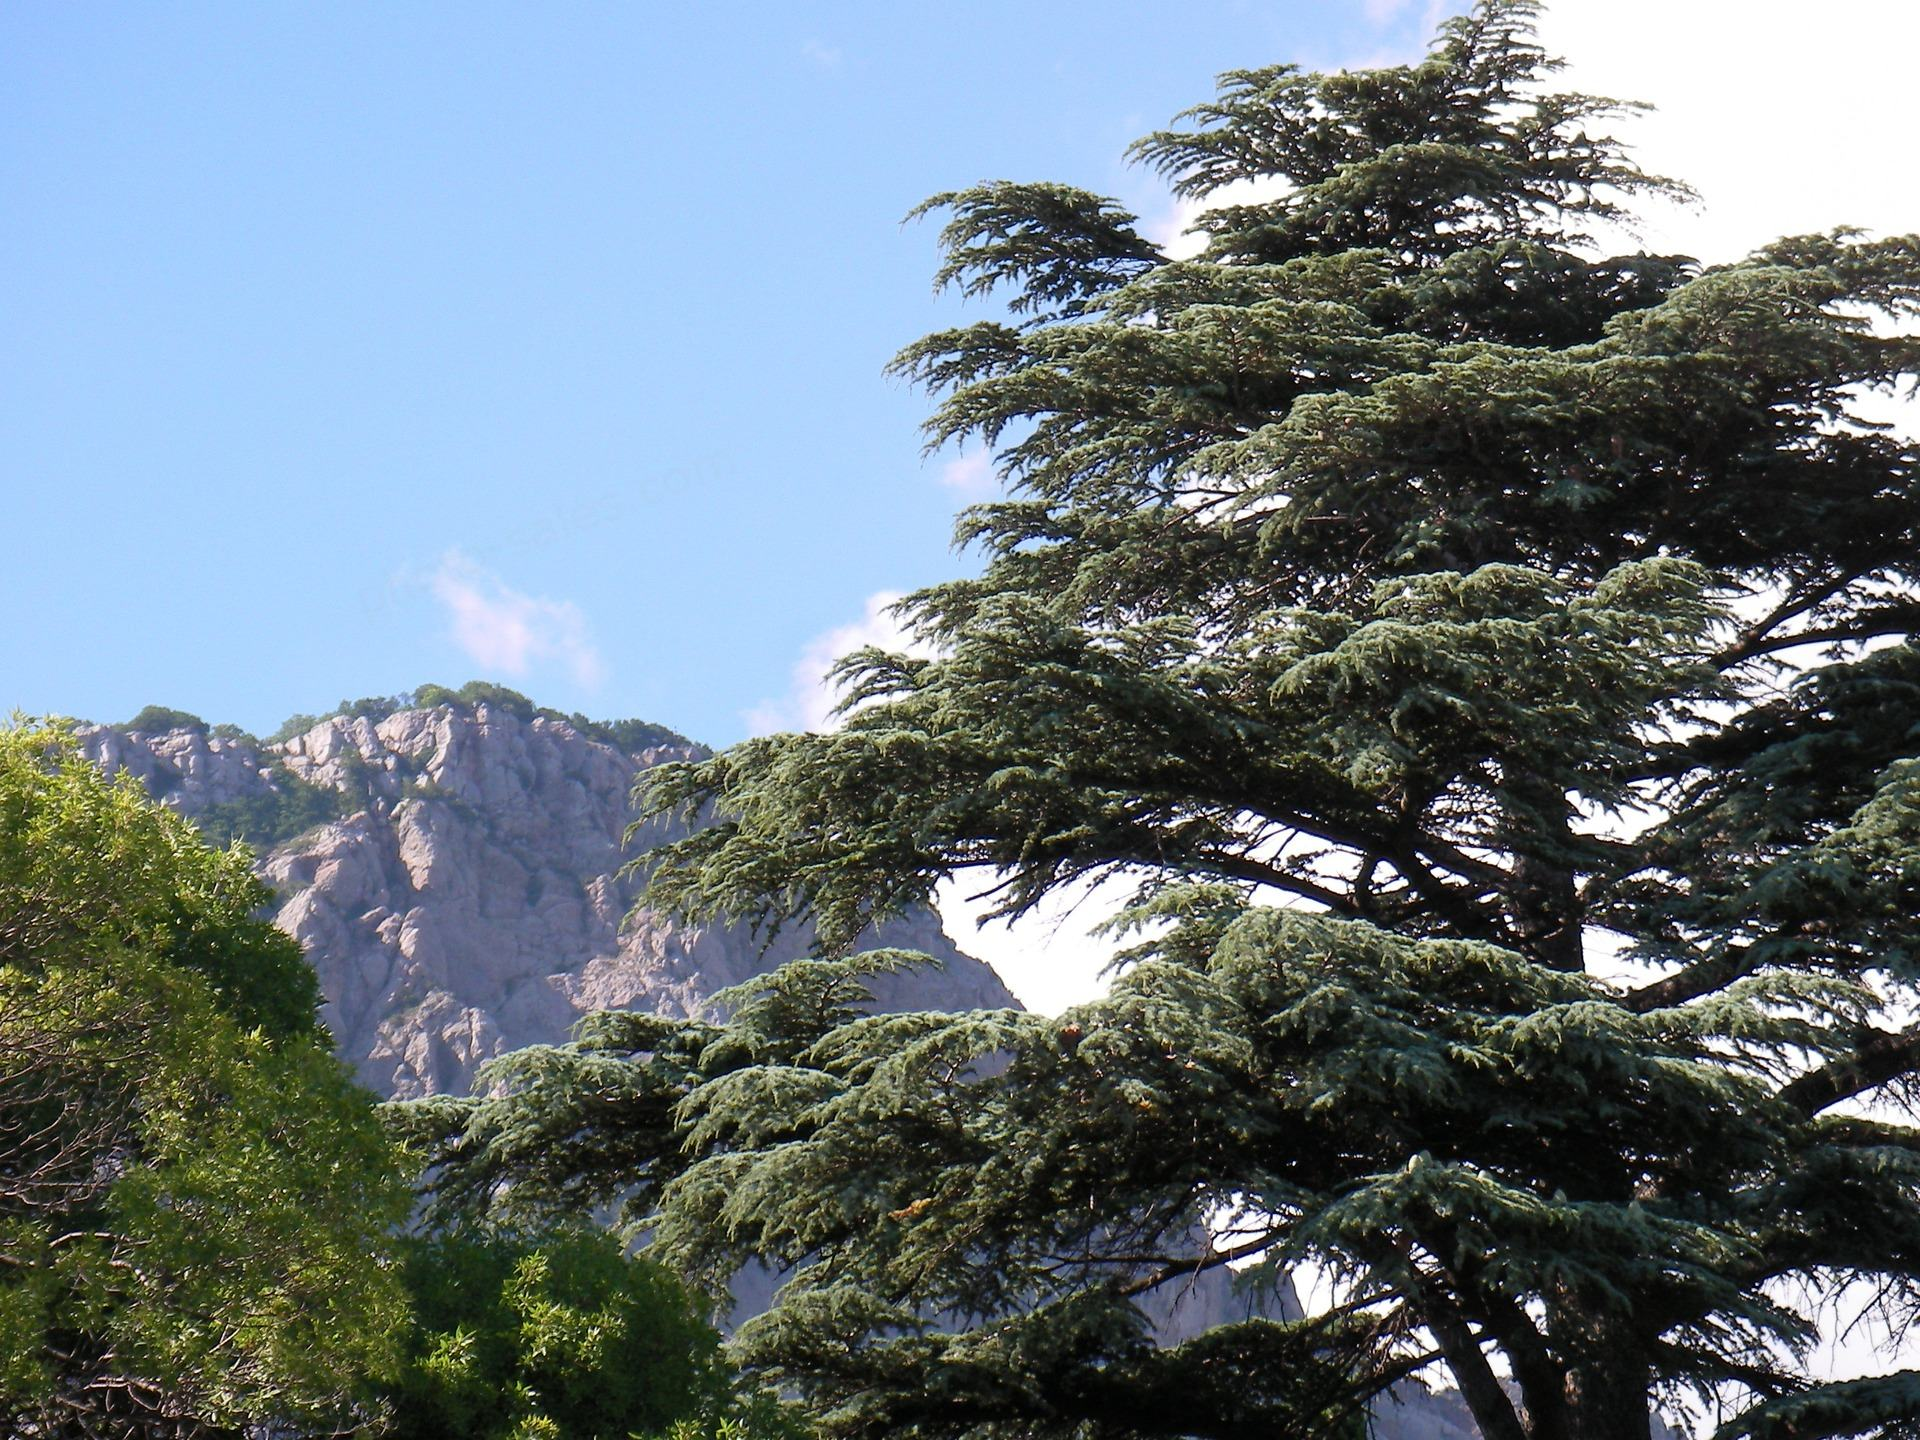 Cedar on the Southern coast of Crimea